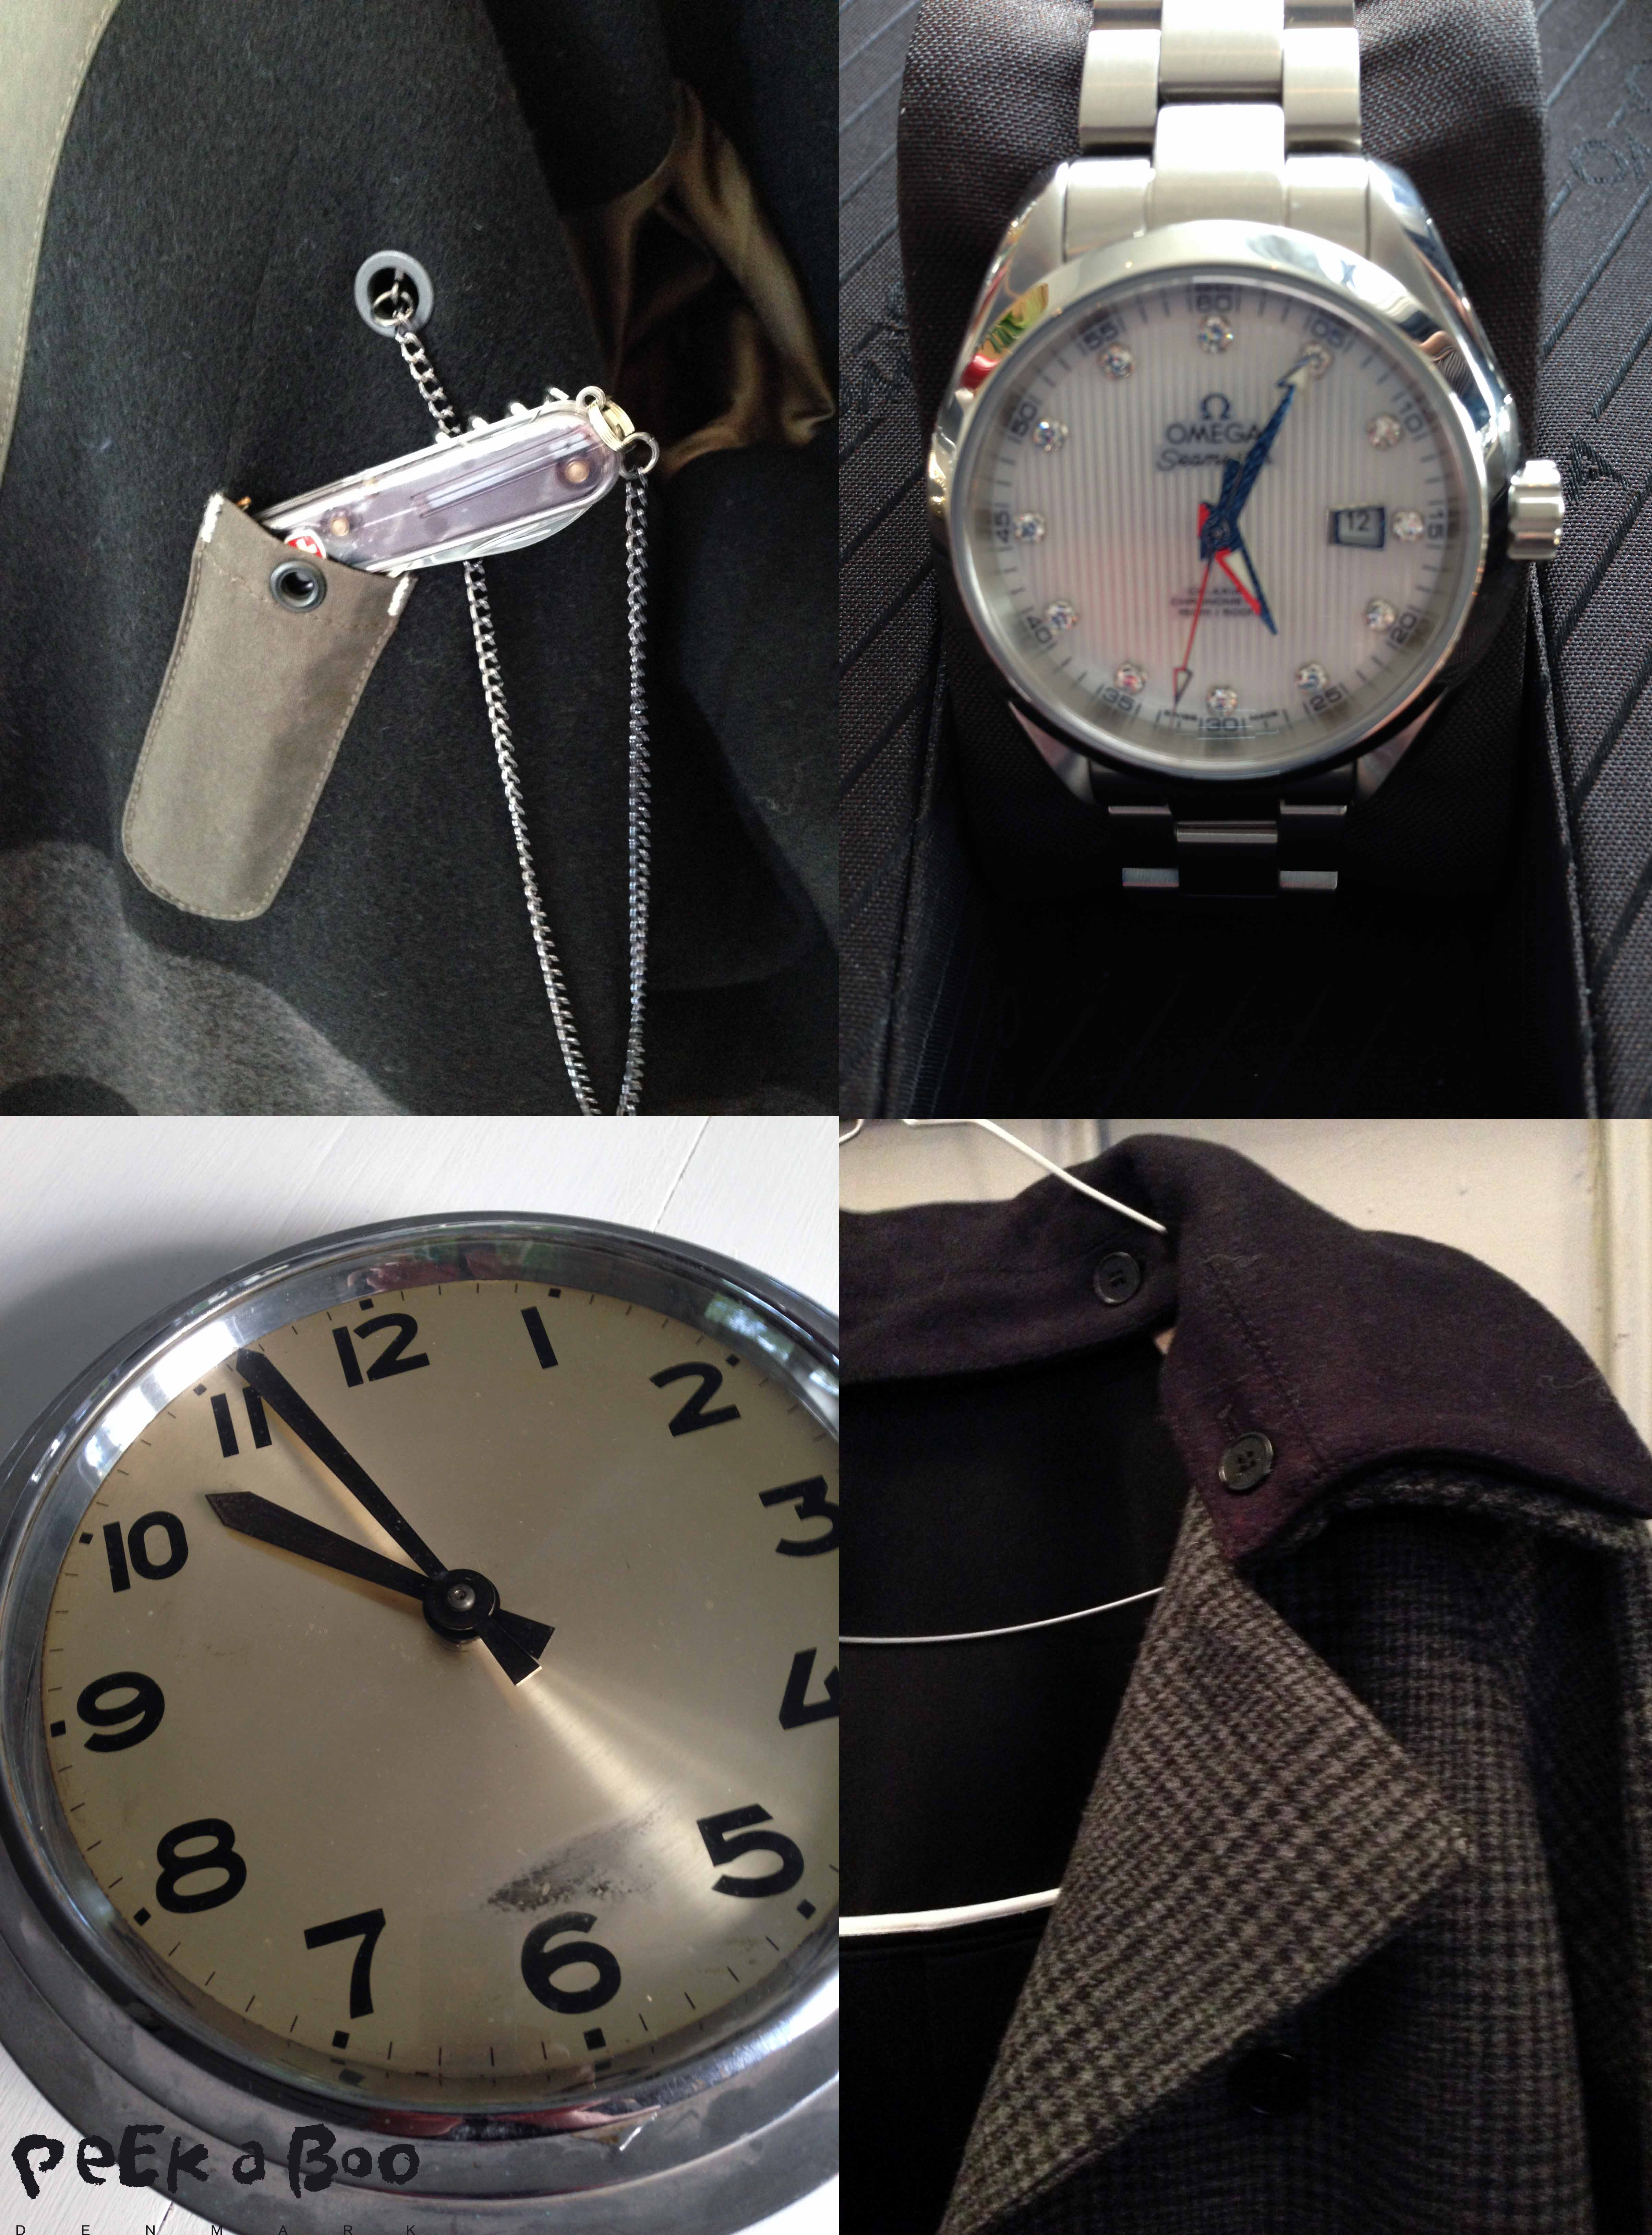 Strellson inside details of outerwear aw14, Omega seamaster for women aw14, vintage wallclock noname, gant female jacket aw14.